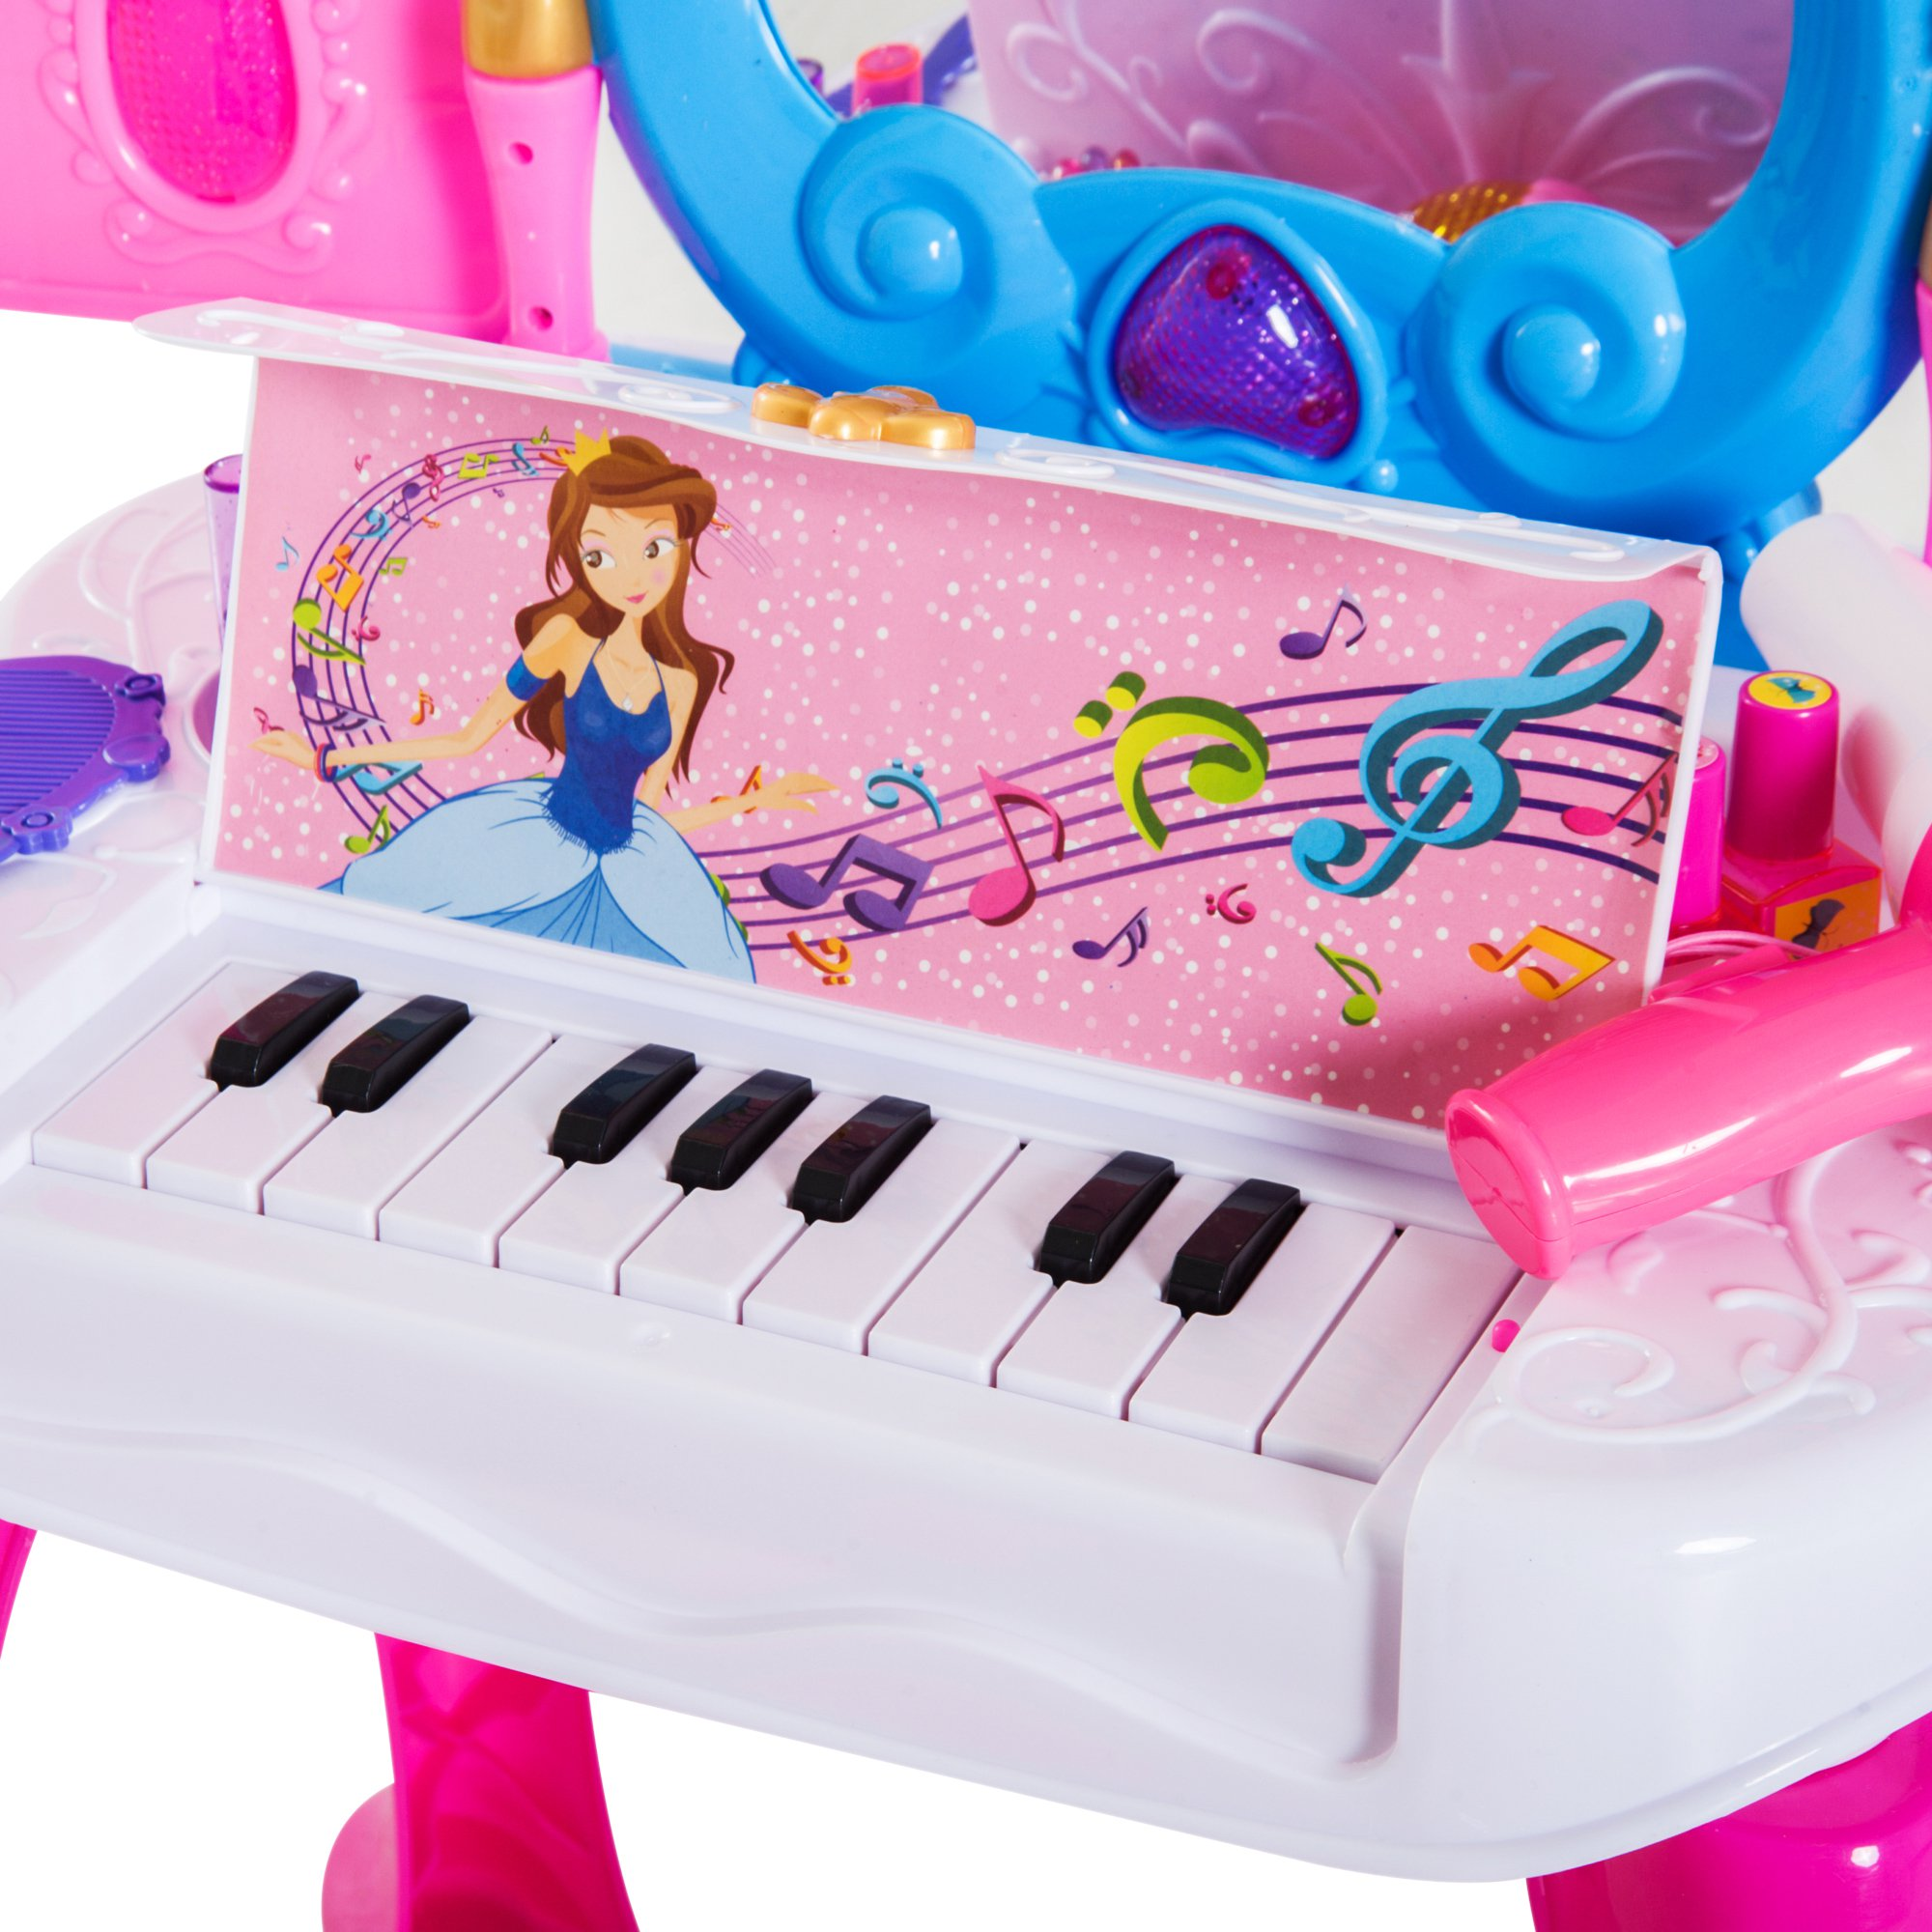 Piano Con Juguete Tocador Espejo Remoto Infantil Taburete Mesita ymP8wONnv0